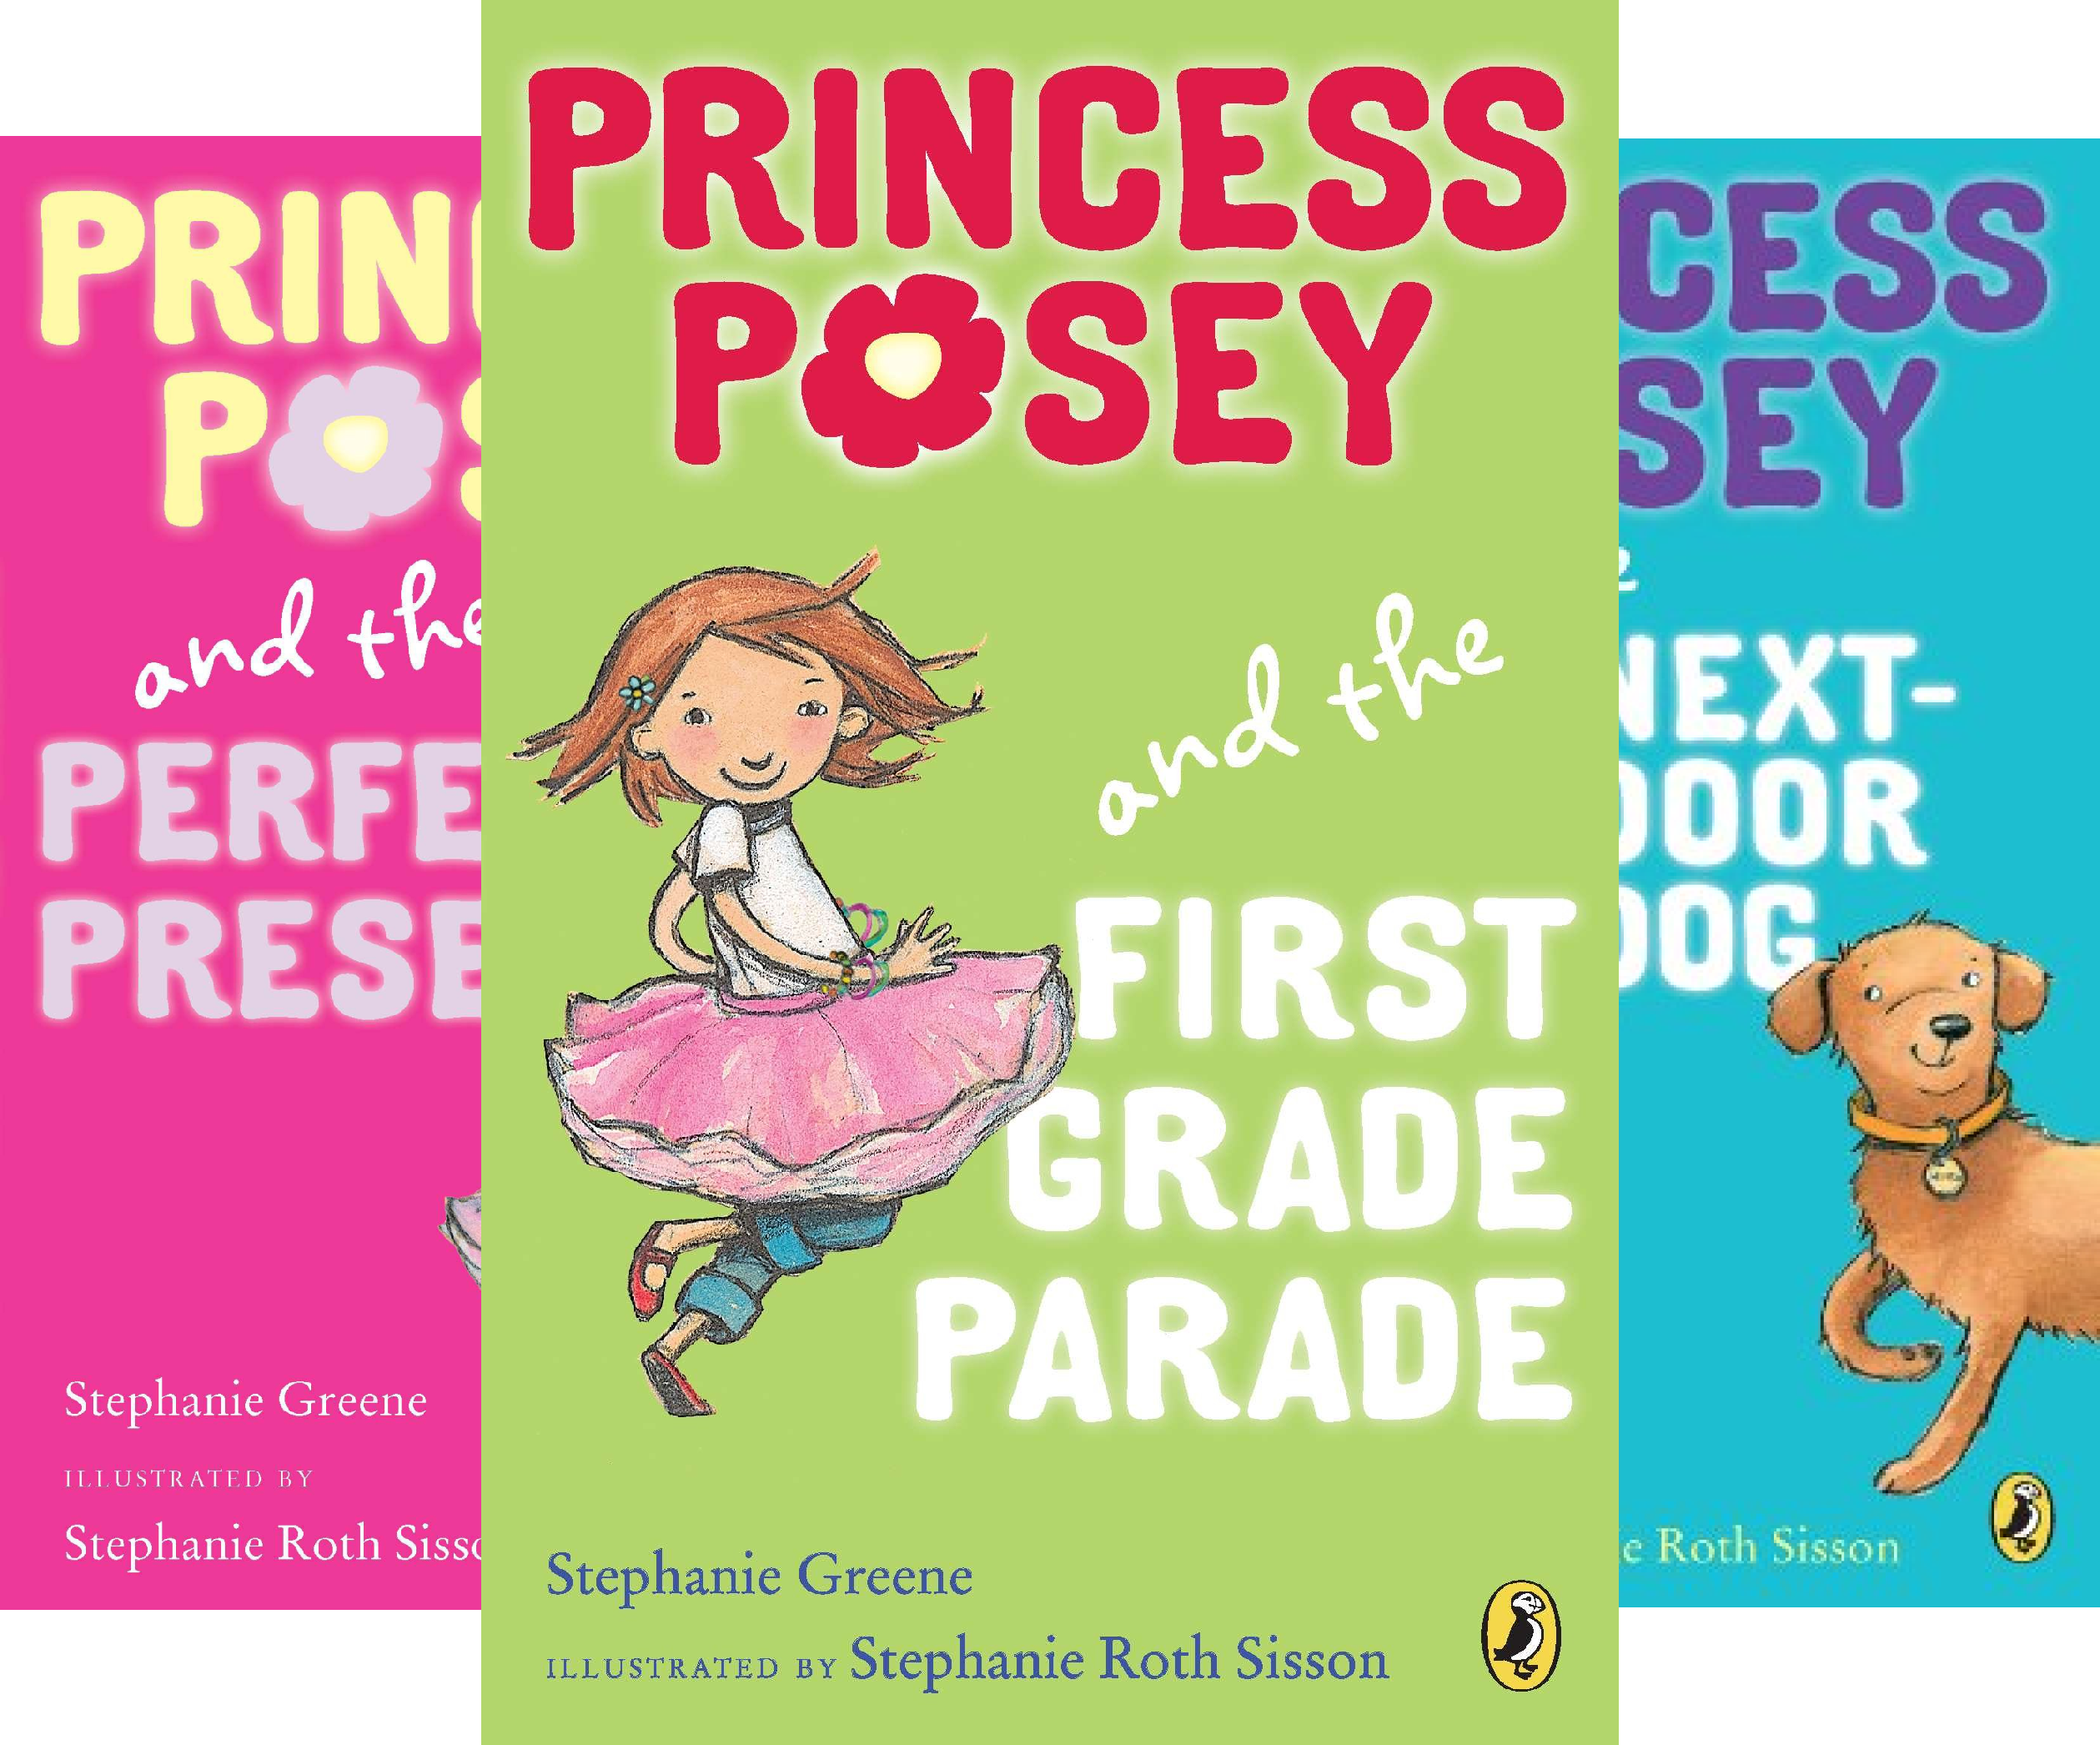 Princess Posey, First Grader (12 Book Series)